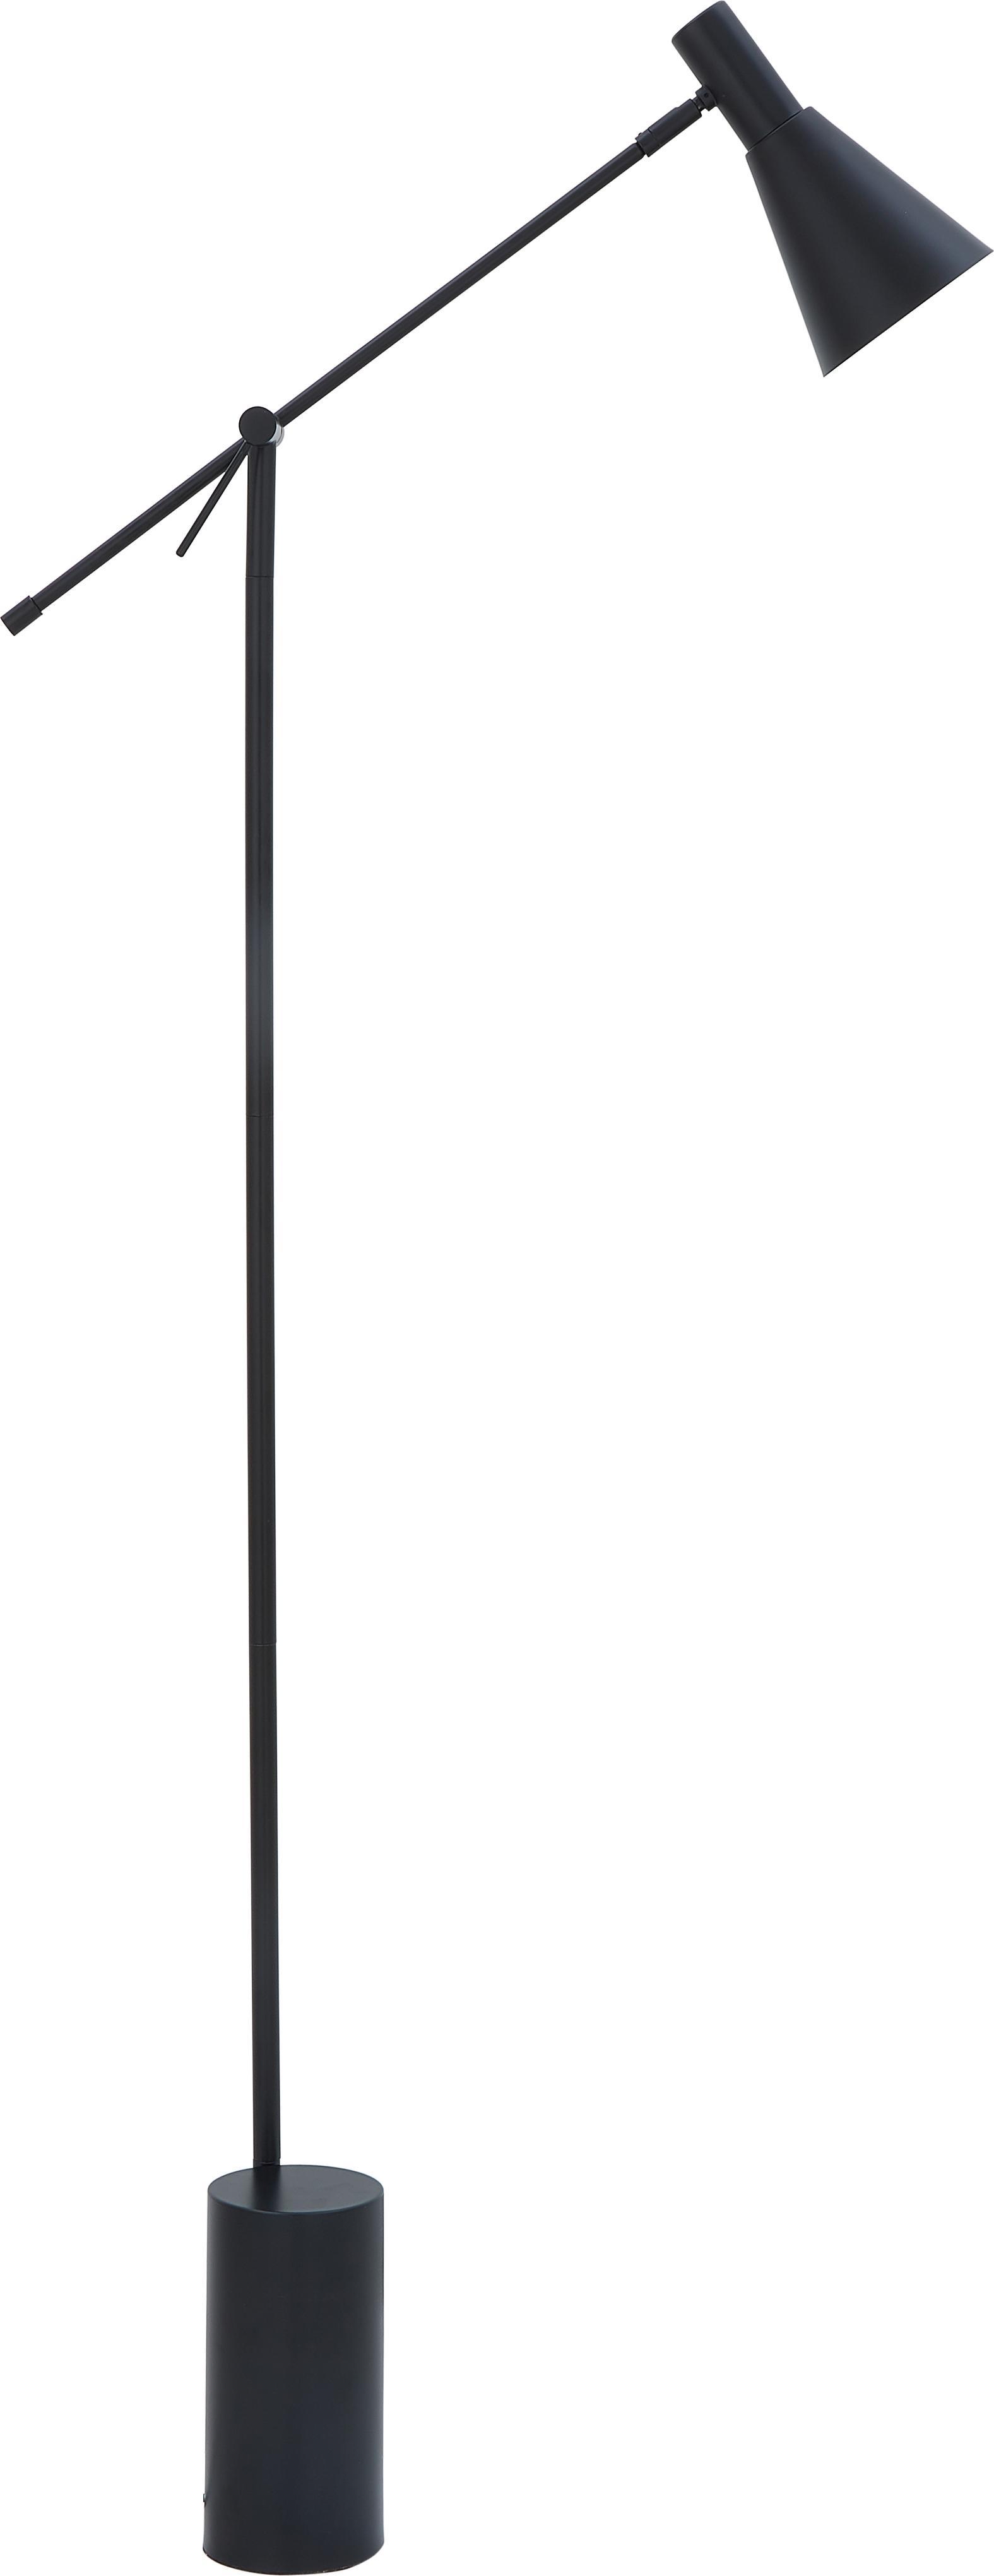 Stehlampe Sia, Lampenschirm: Metall, pulverbeschichtet, Lampenfuß: Metall, pulverbeschichtet, Schwarz, Ø 14 x H 162 cm